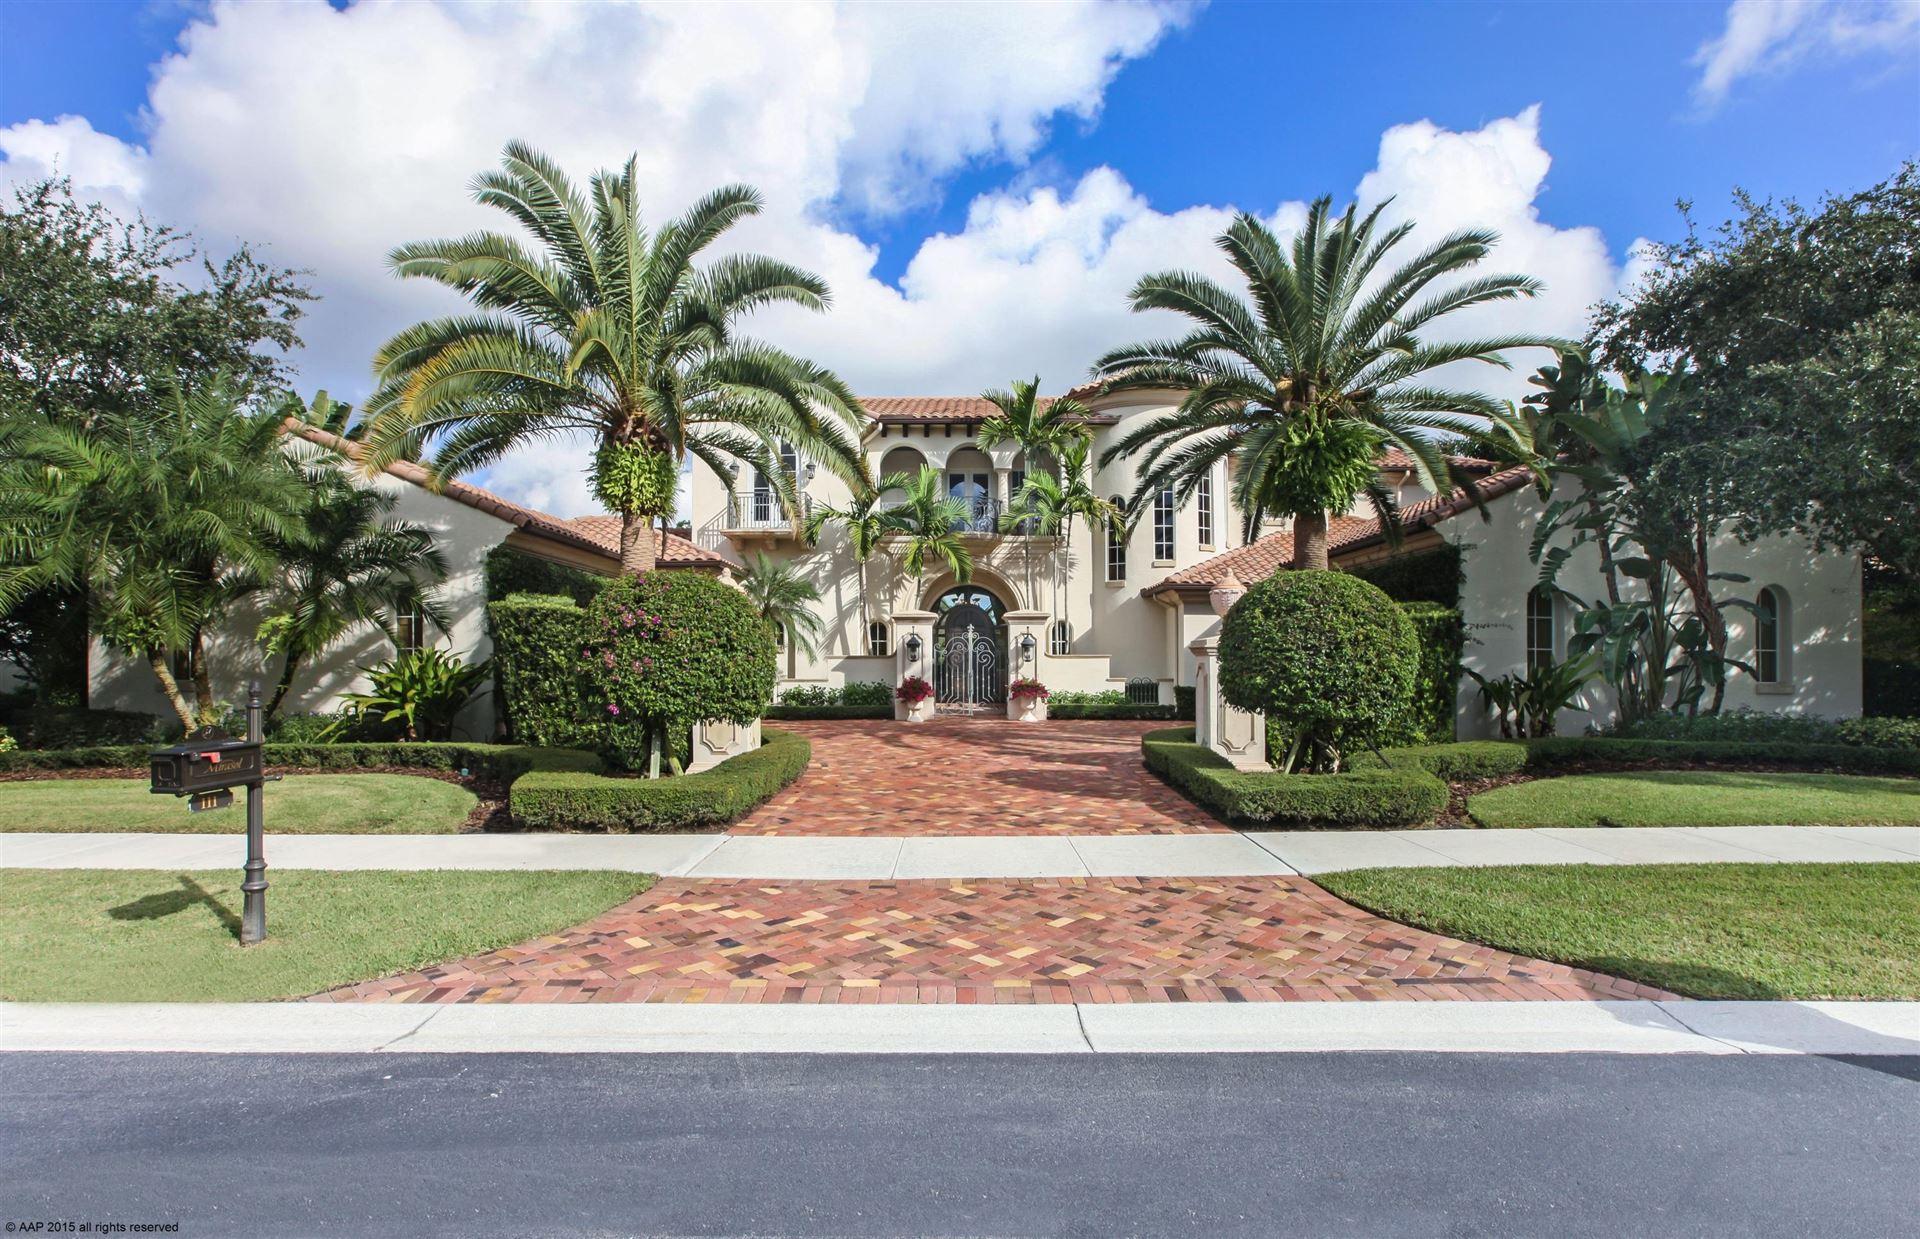 Photo of 111 Via Palacio, Palm Beach Gardens, FL 33418 (MLS # RX-10682684)